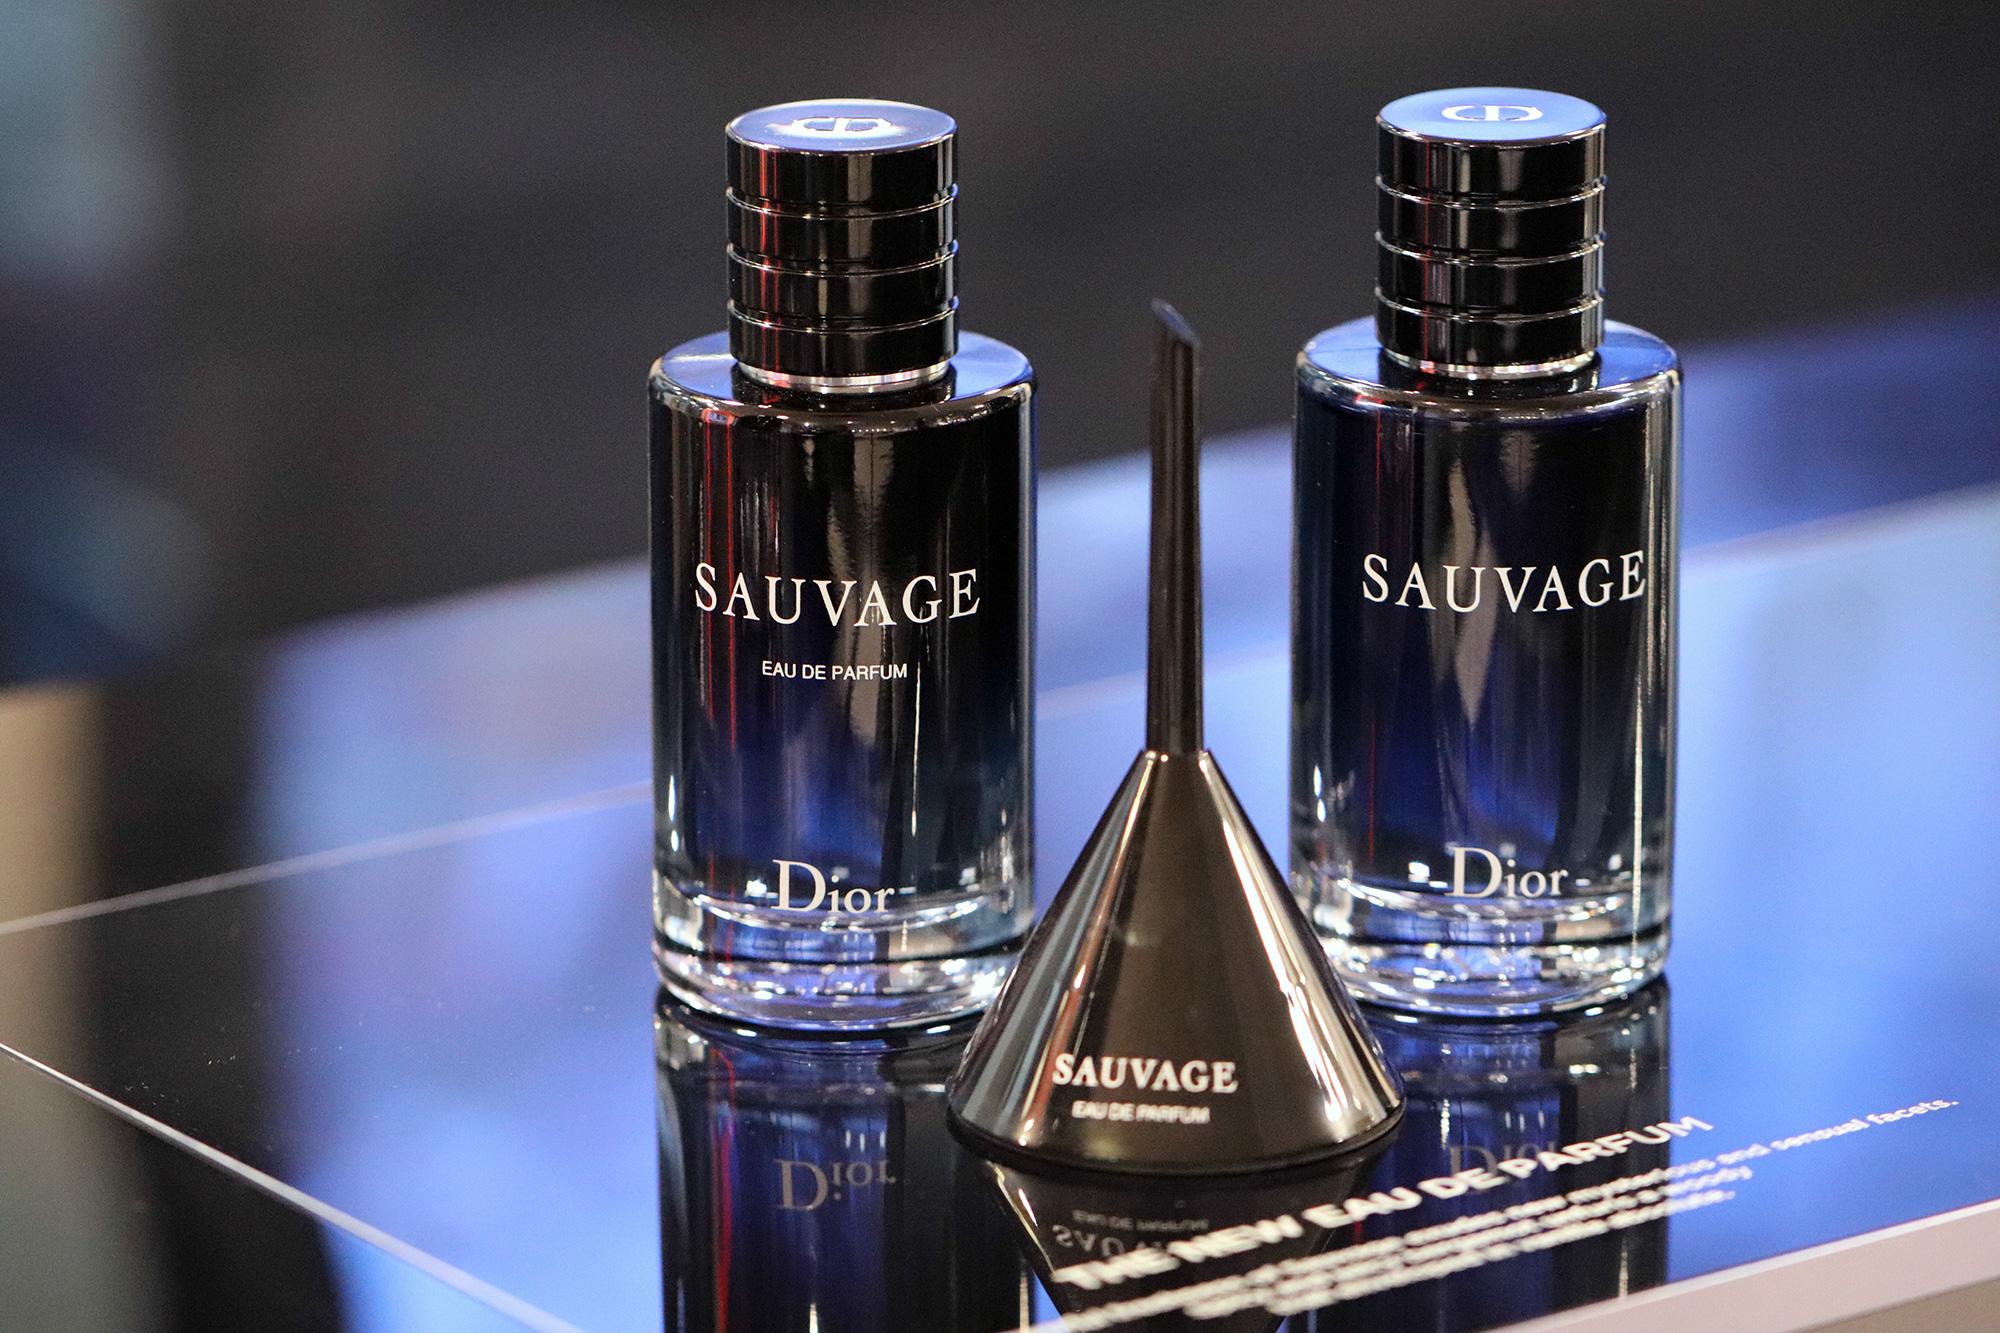 dior sauvage eau de parfum new fragrances. Black Bedroom Furniture Sets. Home Design Ideas